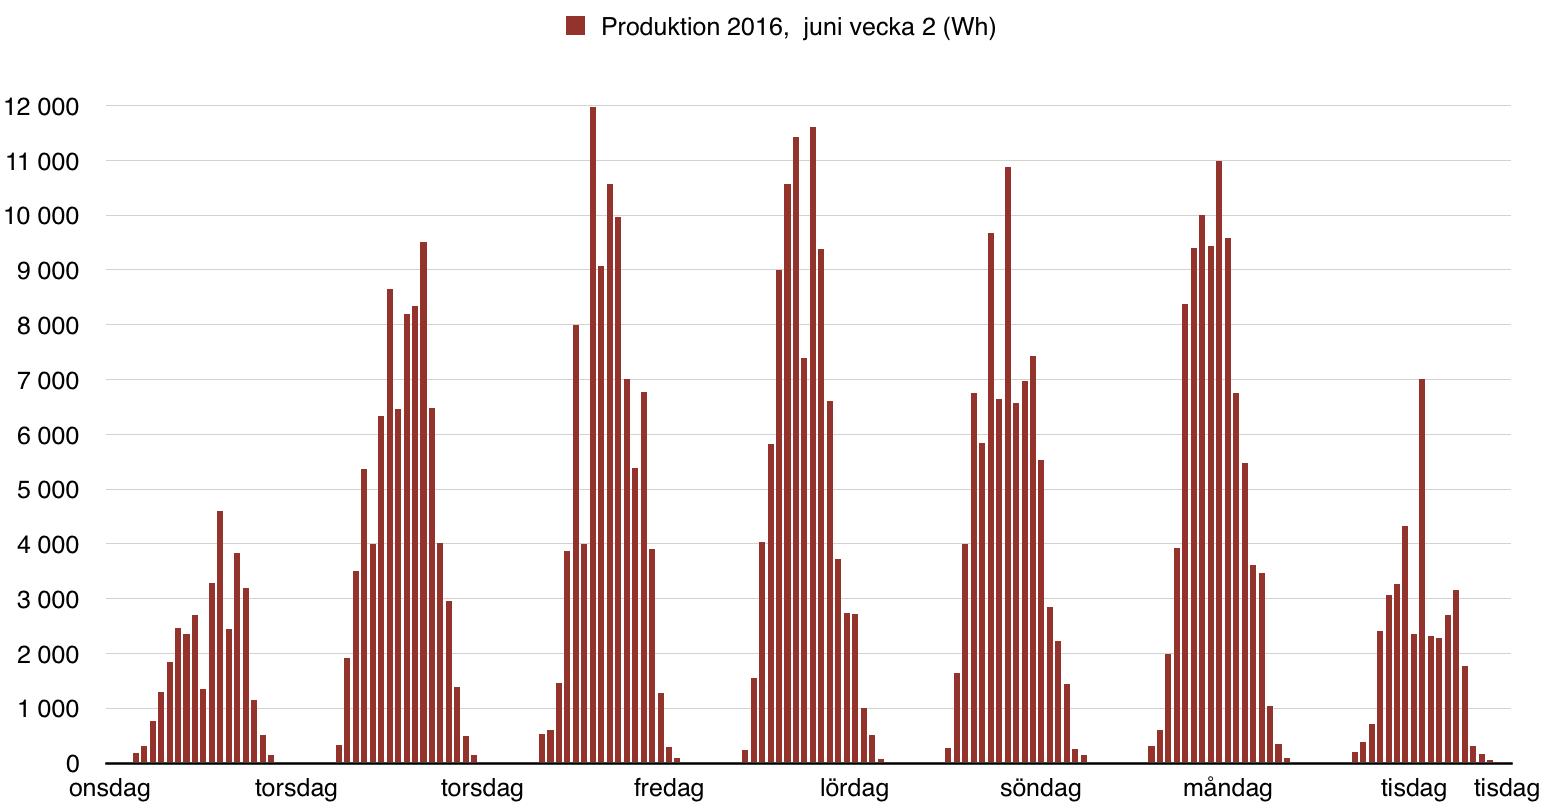 Solceller - Produktion 2016 - juni vecka 2